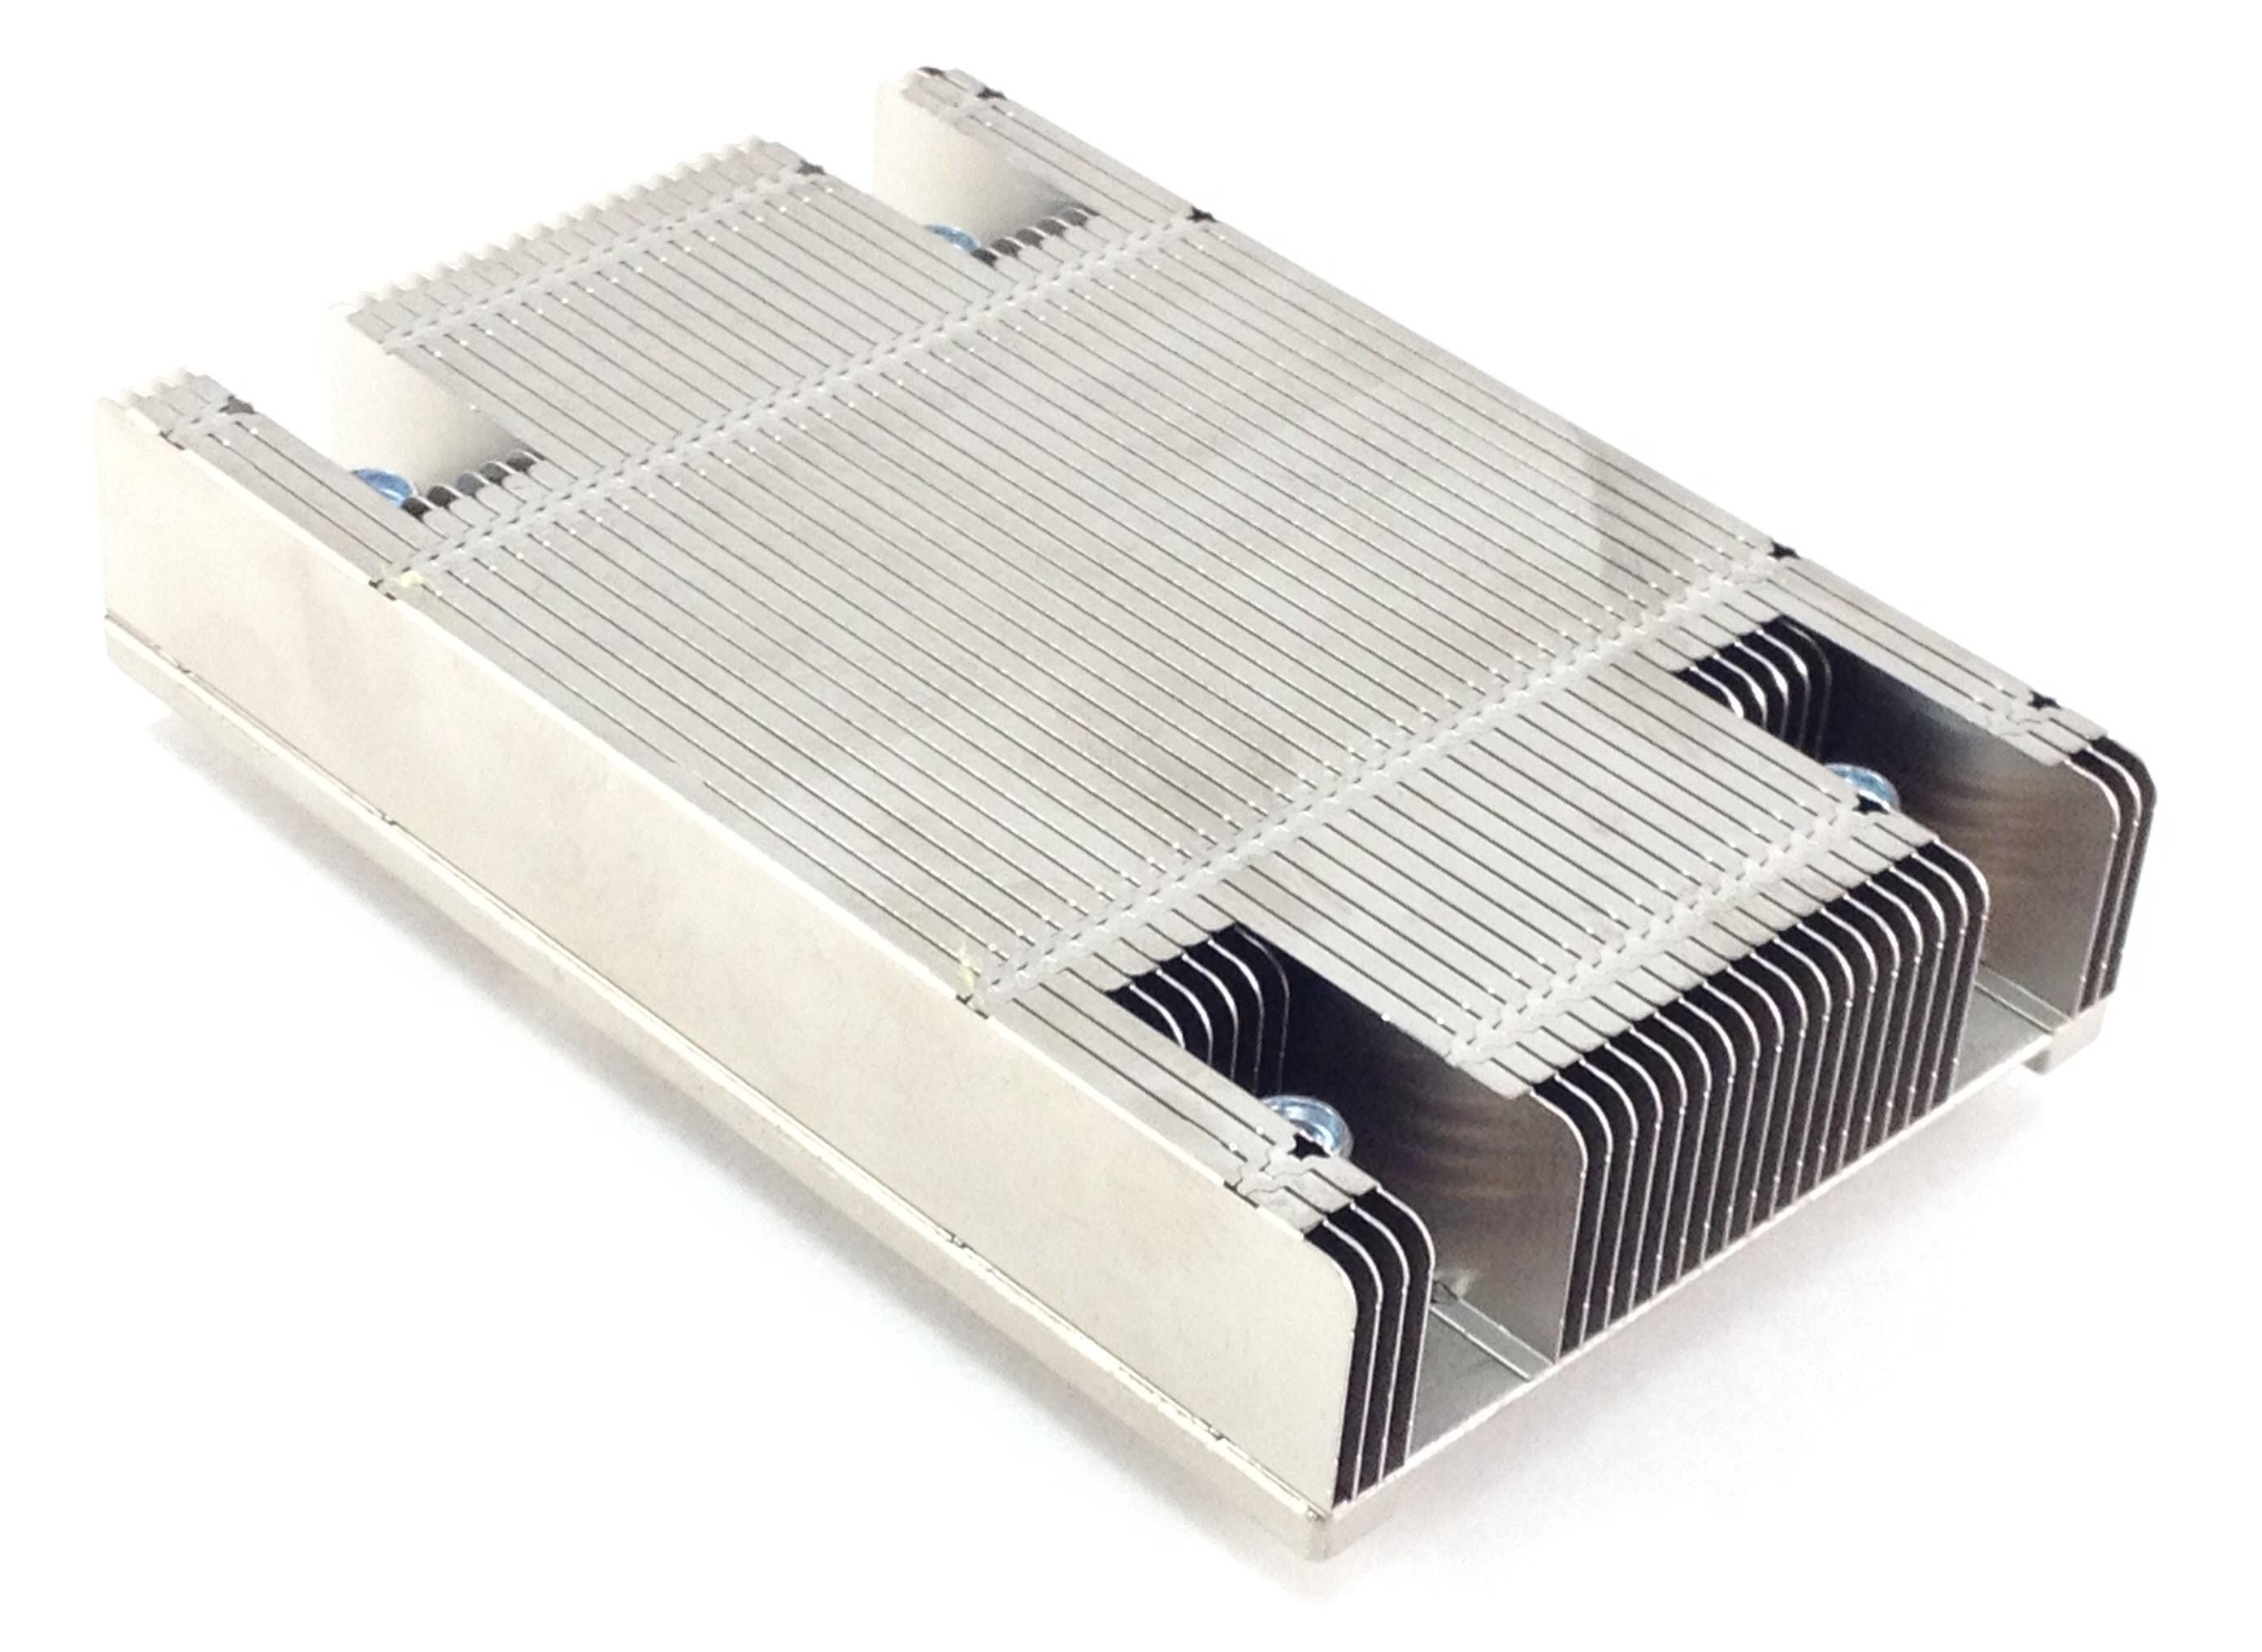 Dell Standard PowerEdge R630 Heatsink (H1M29)